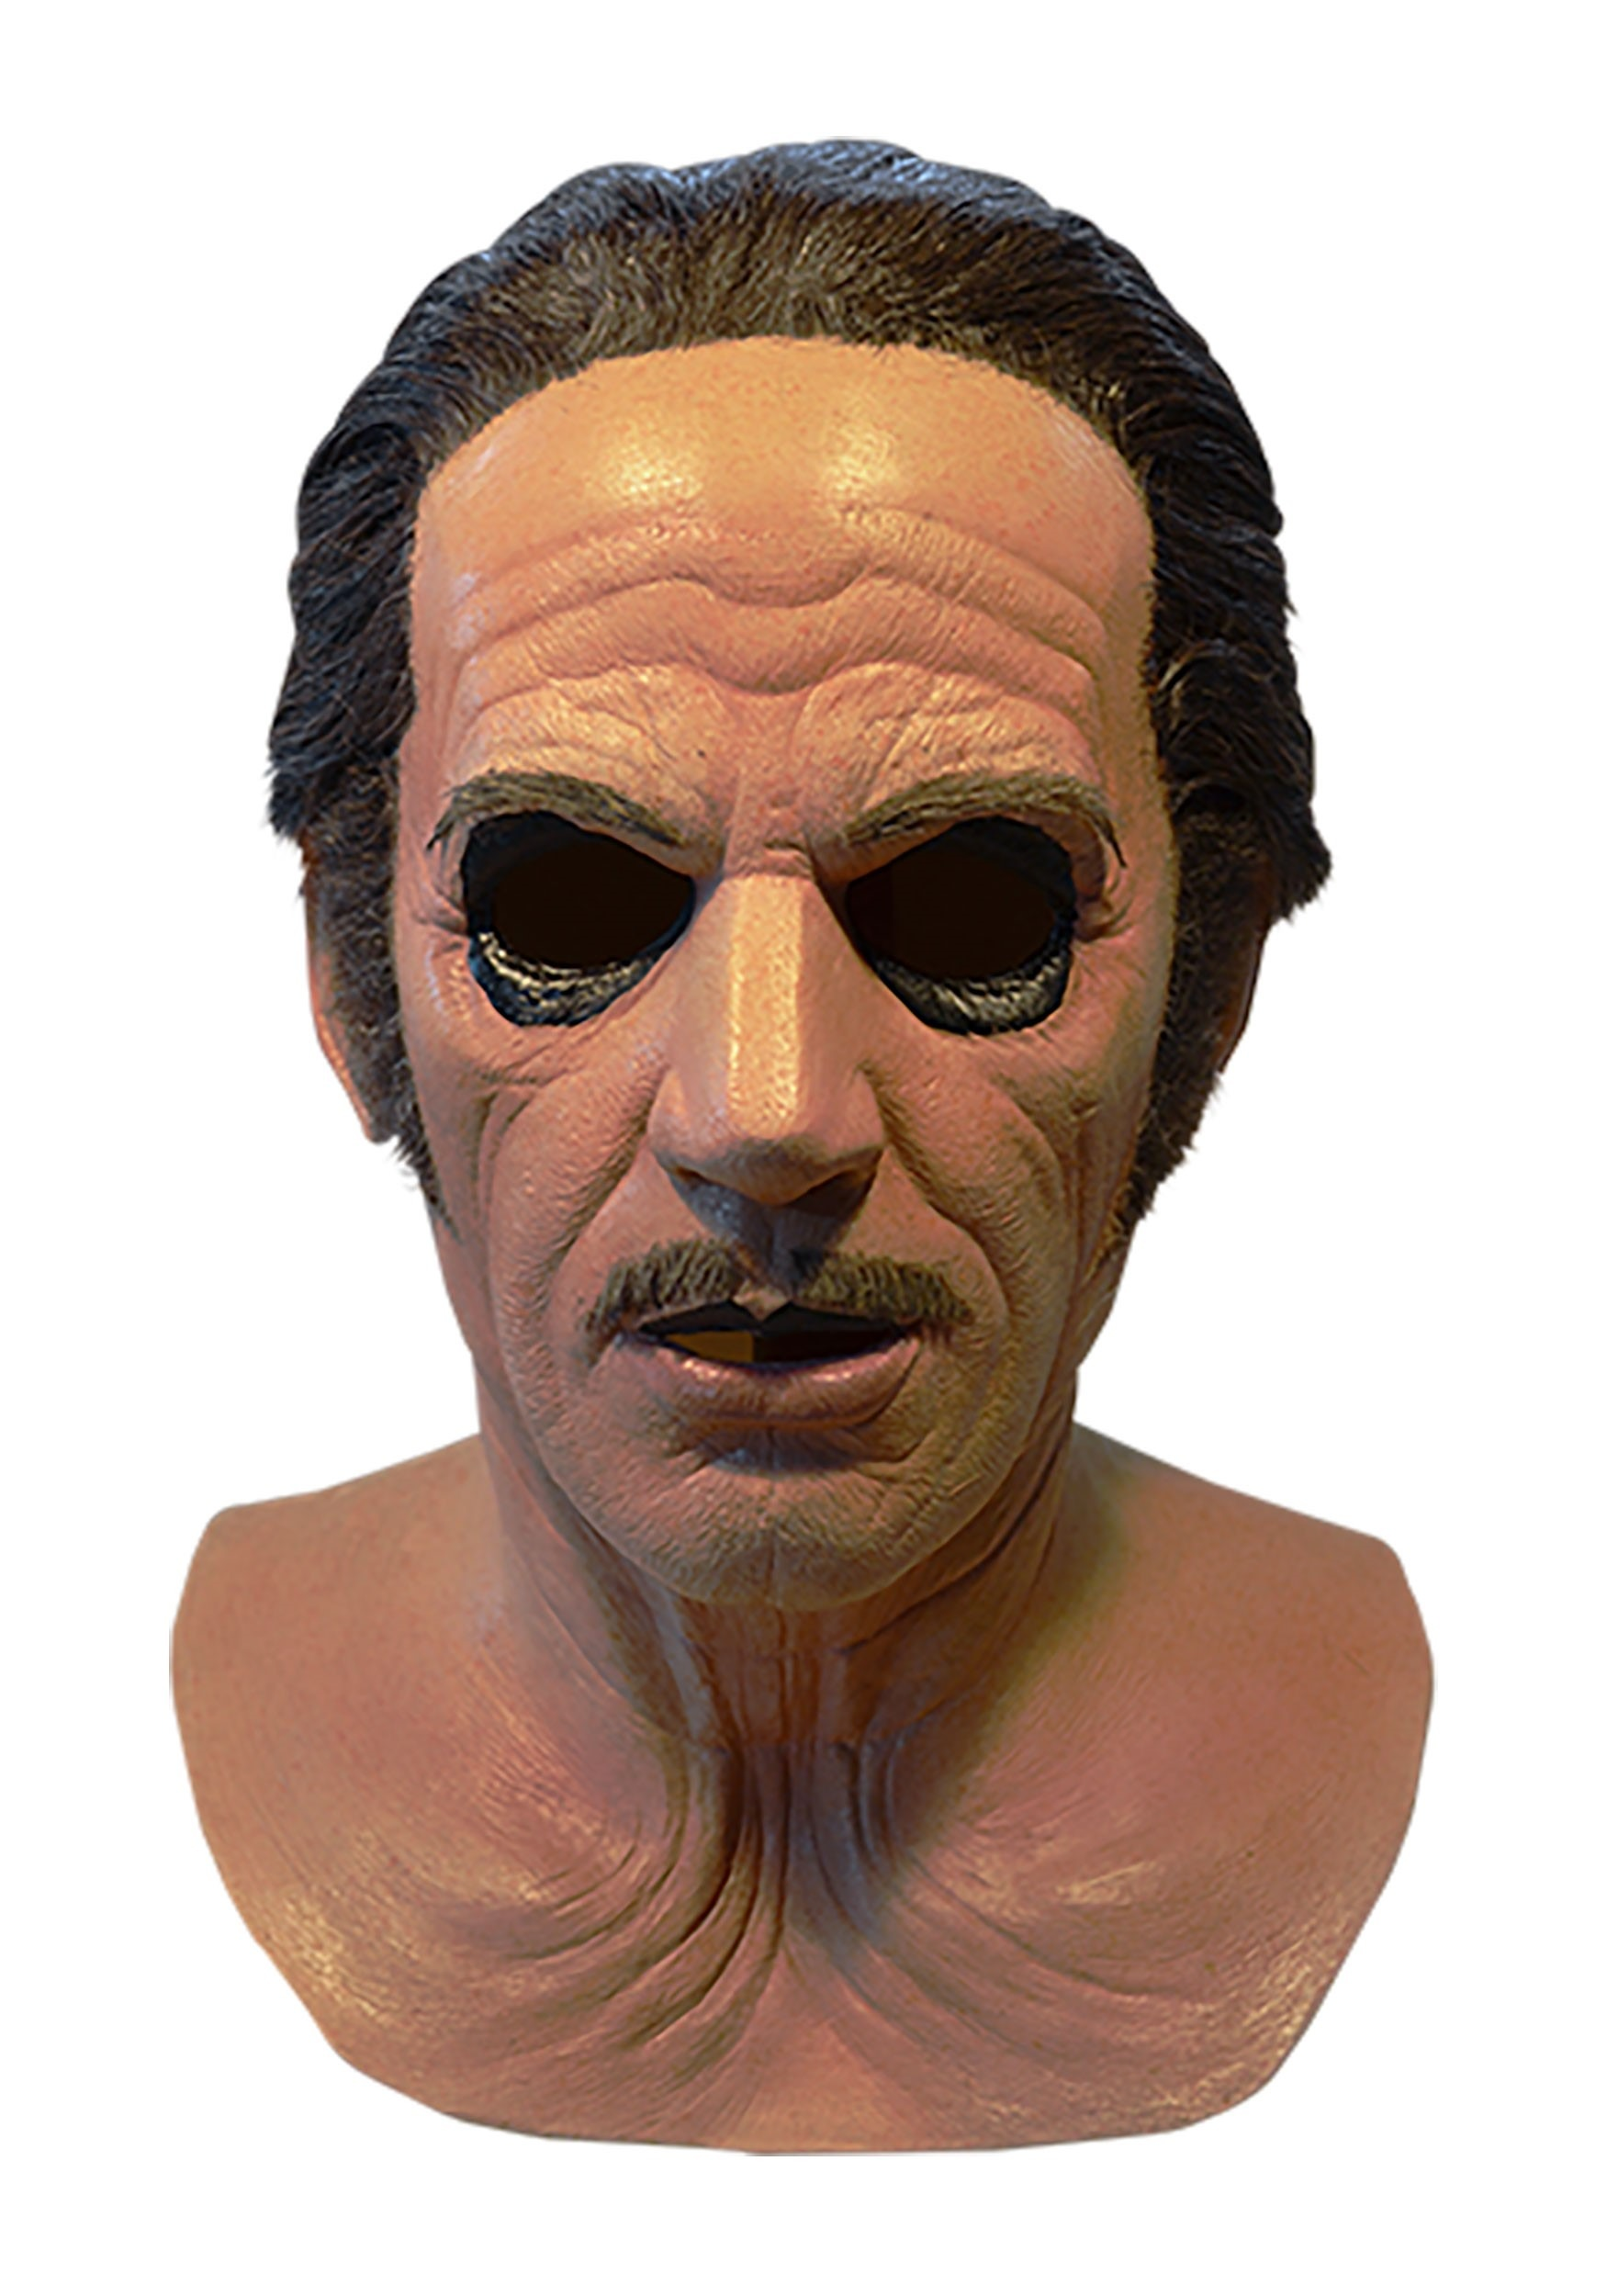 Cardinal Copia Ghost Mask